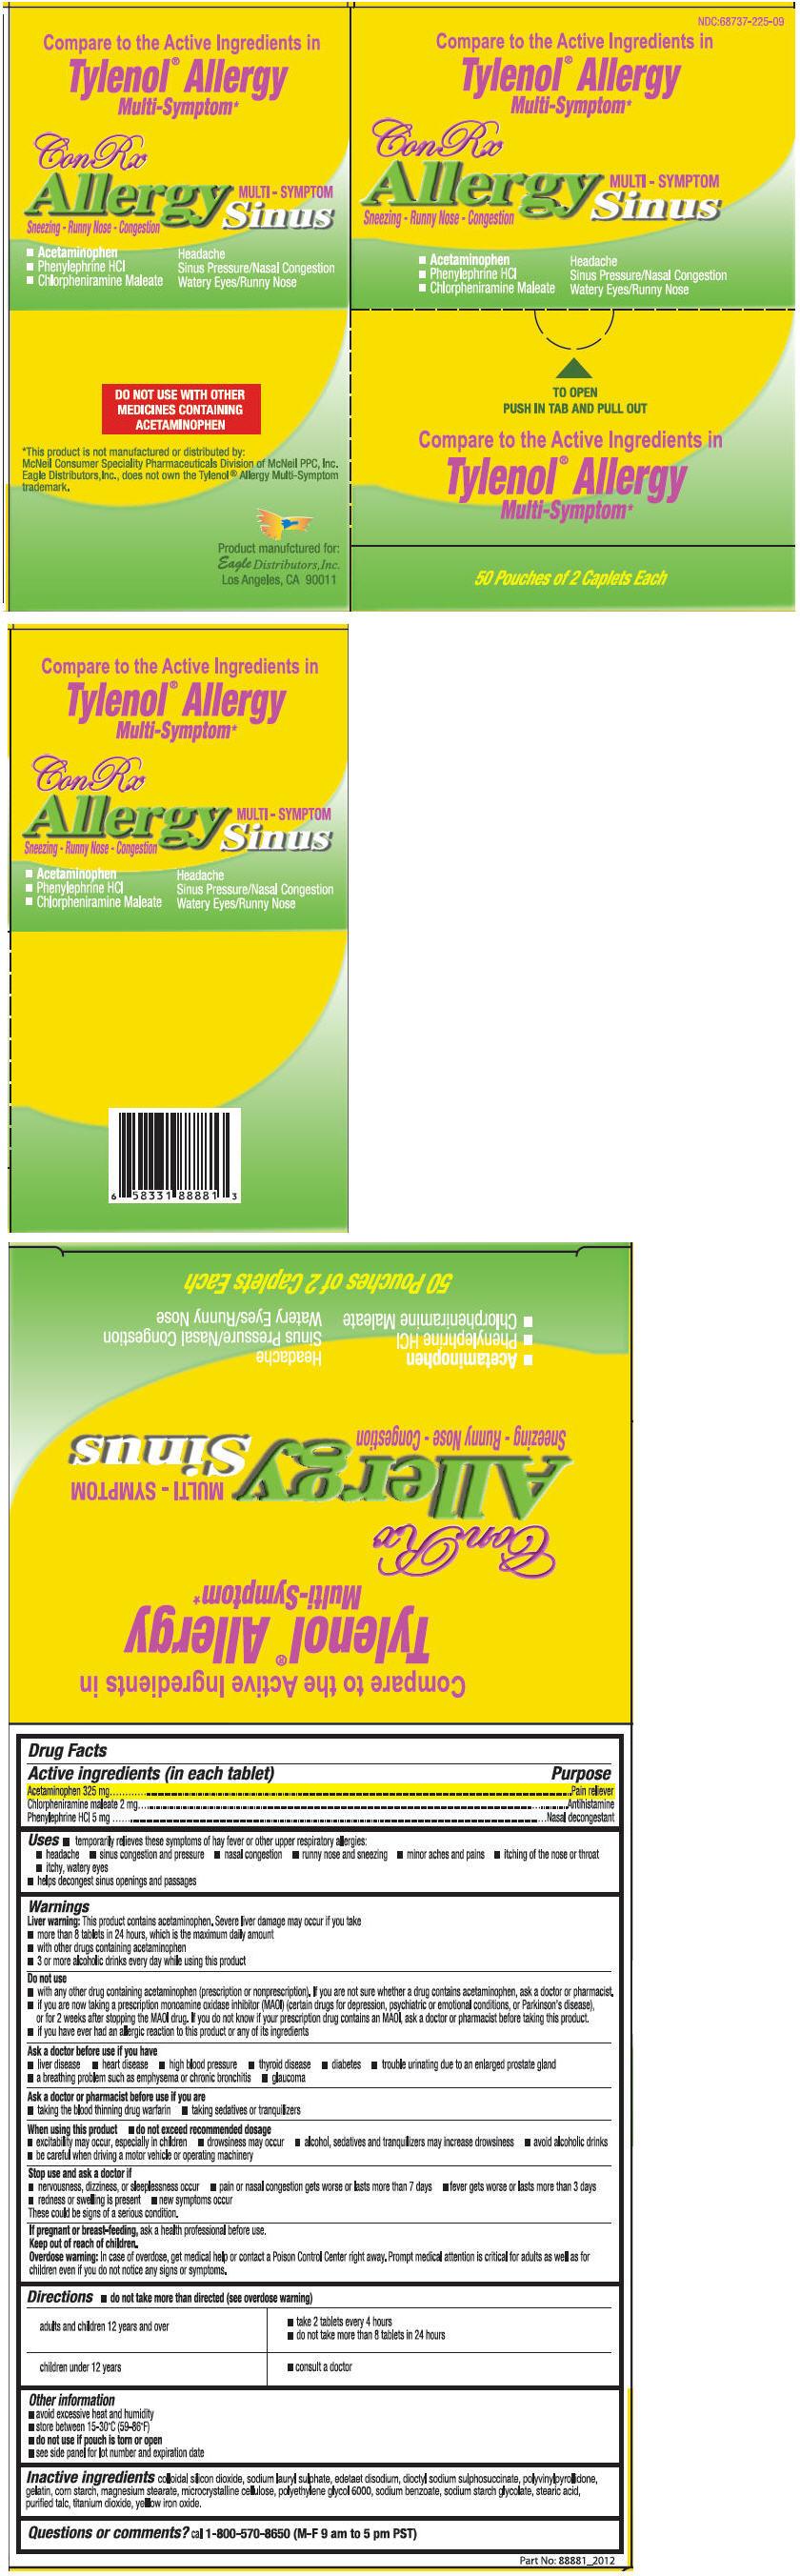 Conrx Allergy Sinus Multi-symptoms (Acetaminophen, Chlorpheniramine Maleate, And Phenylephrine Hydrochloride) Tablet [Eagle Distributors,inc.]